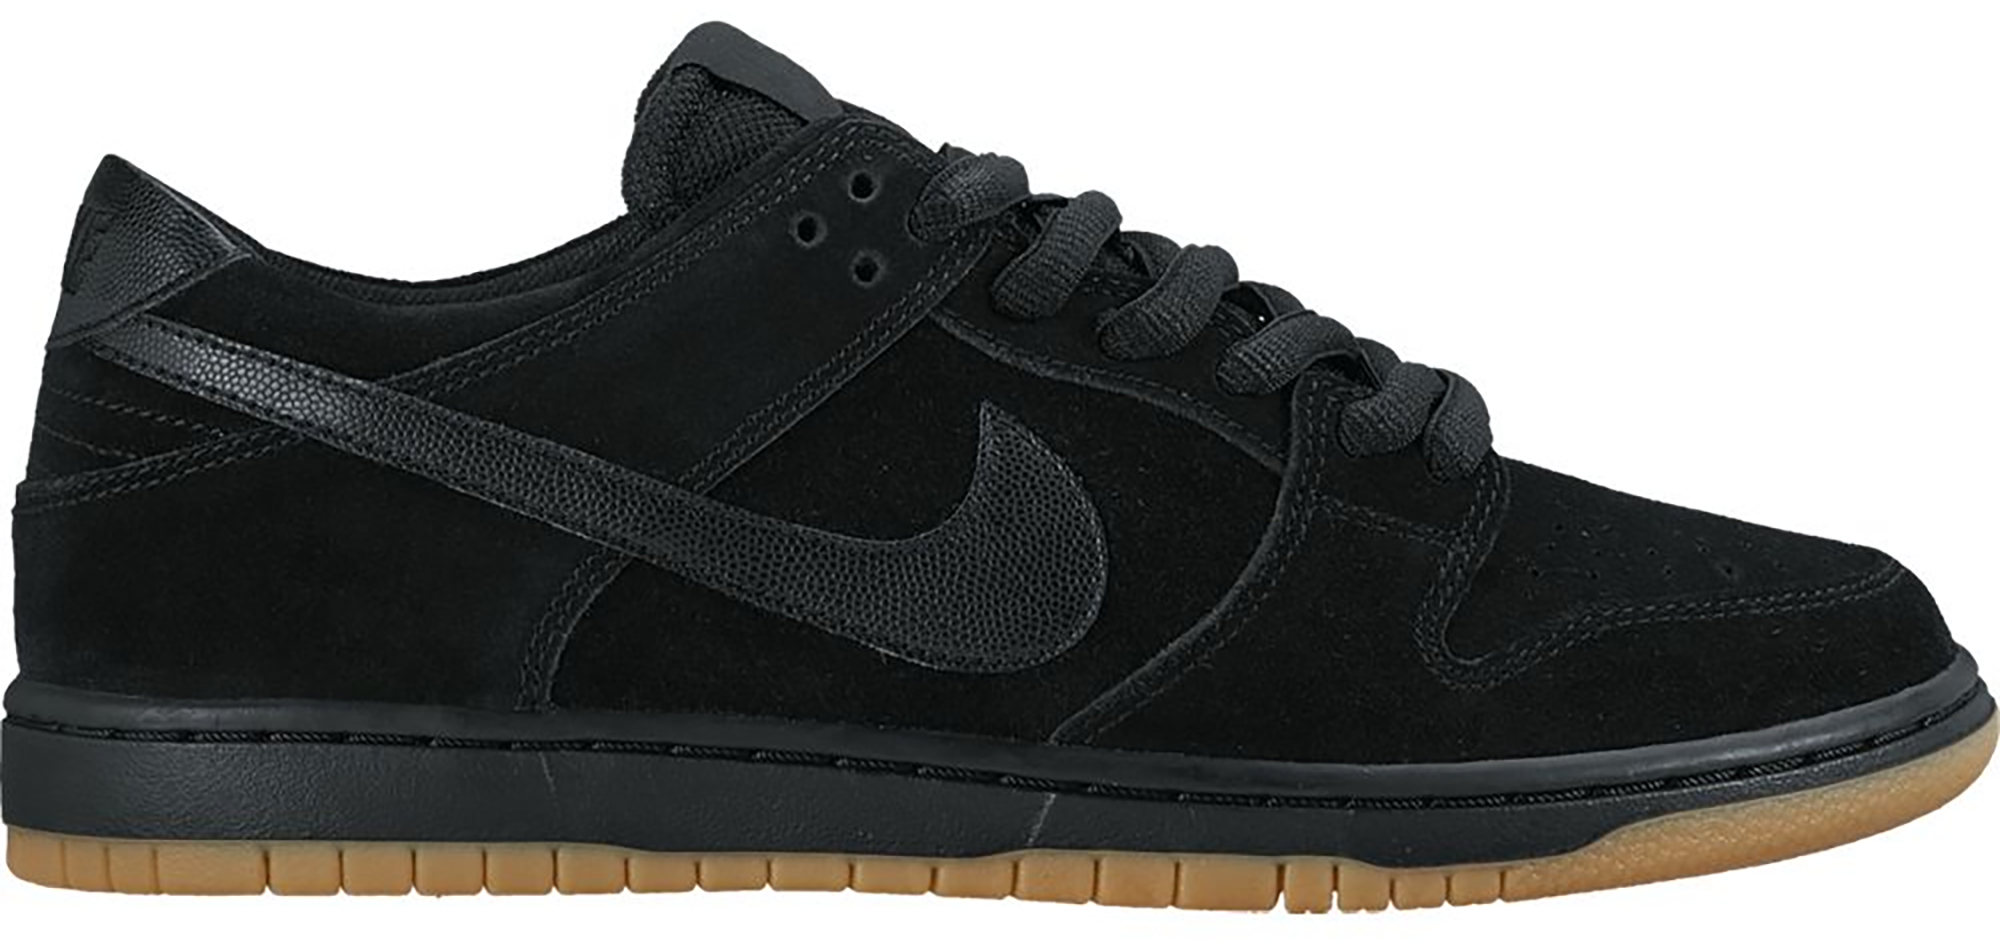 Nike SB Dunk Low IW Black Gum - 819674-002